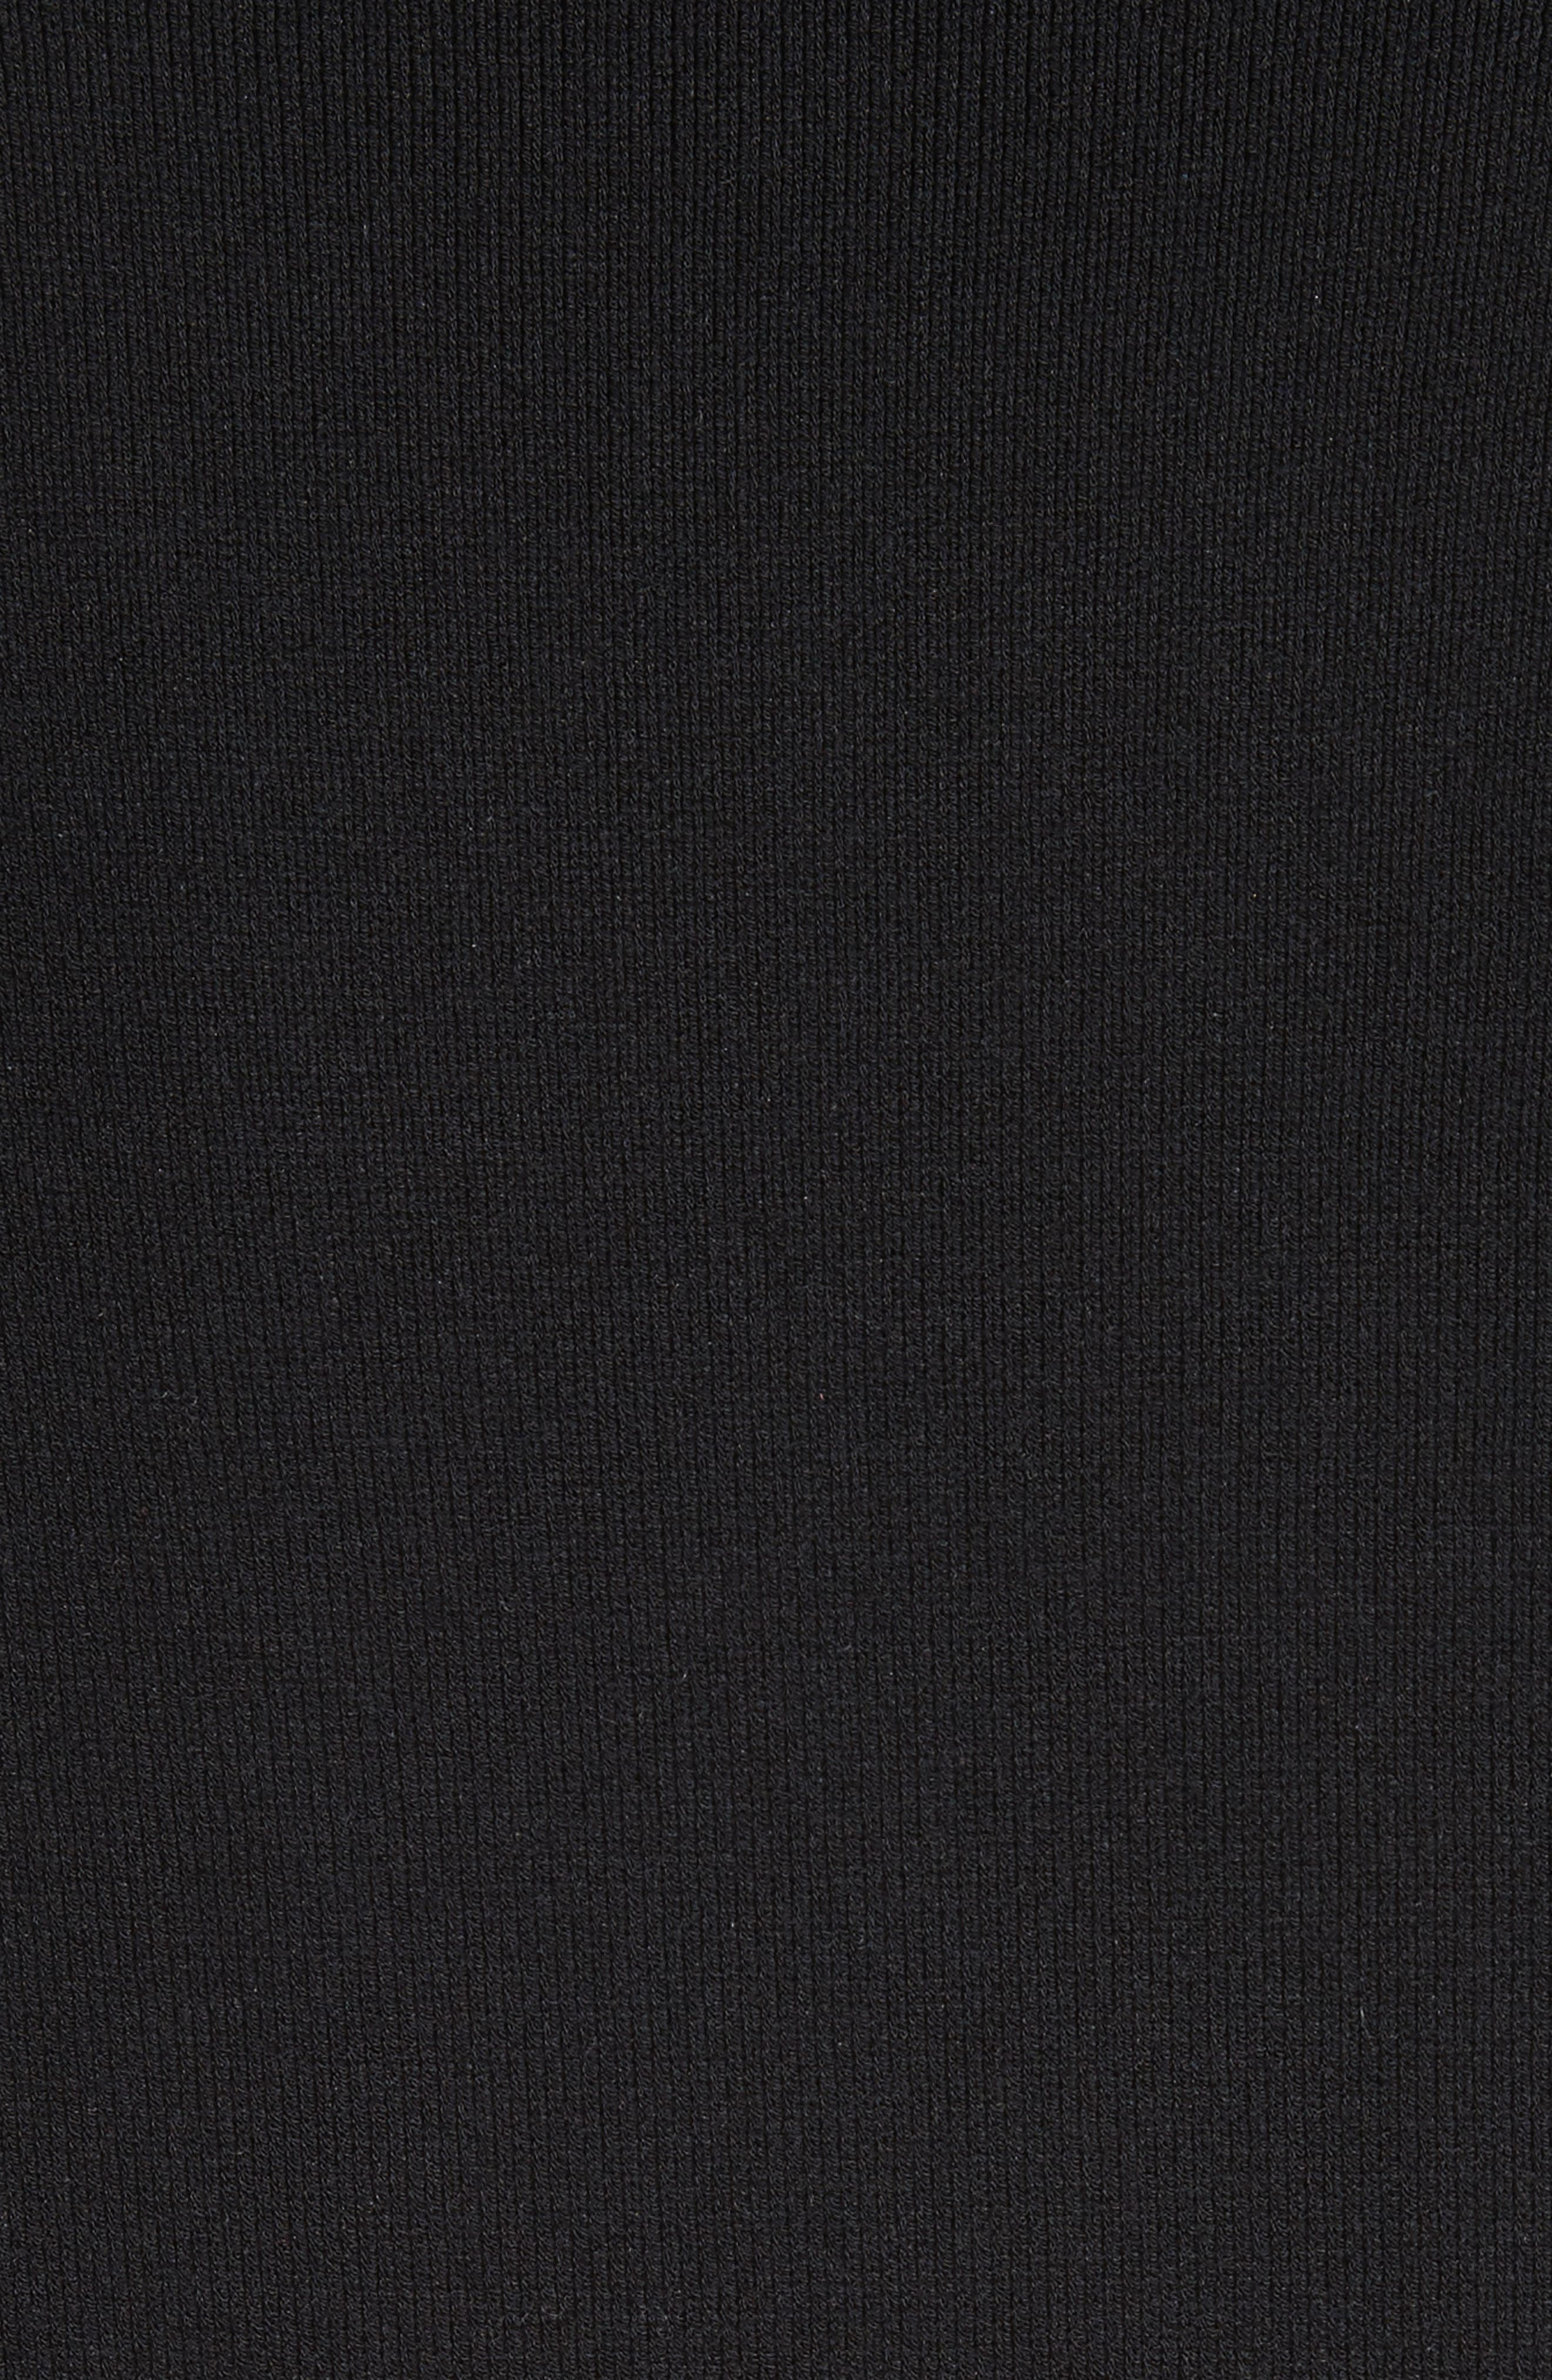 Cashmere Puff Shoulder Turtleneck Sweater,                             Alternate thumbnail 5, color,                             001